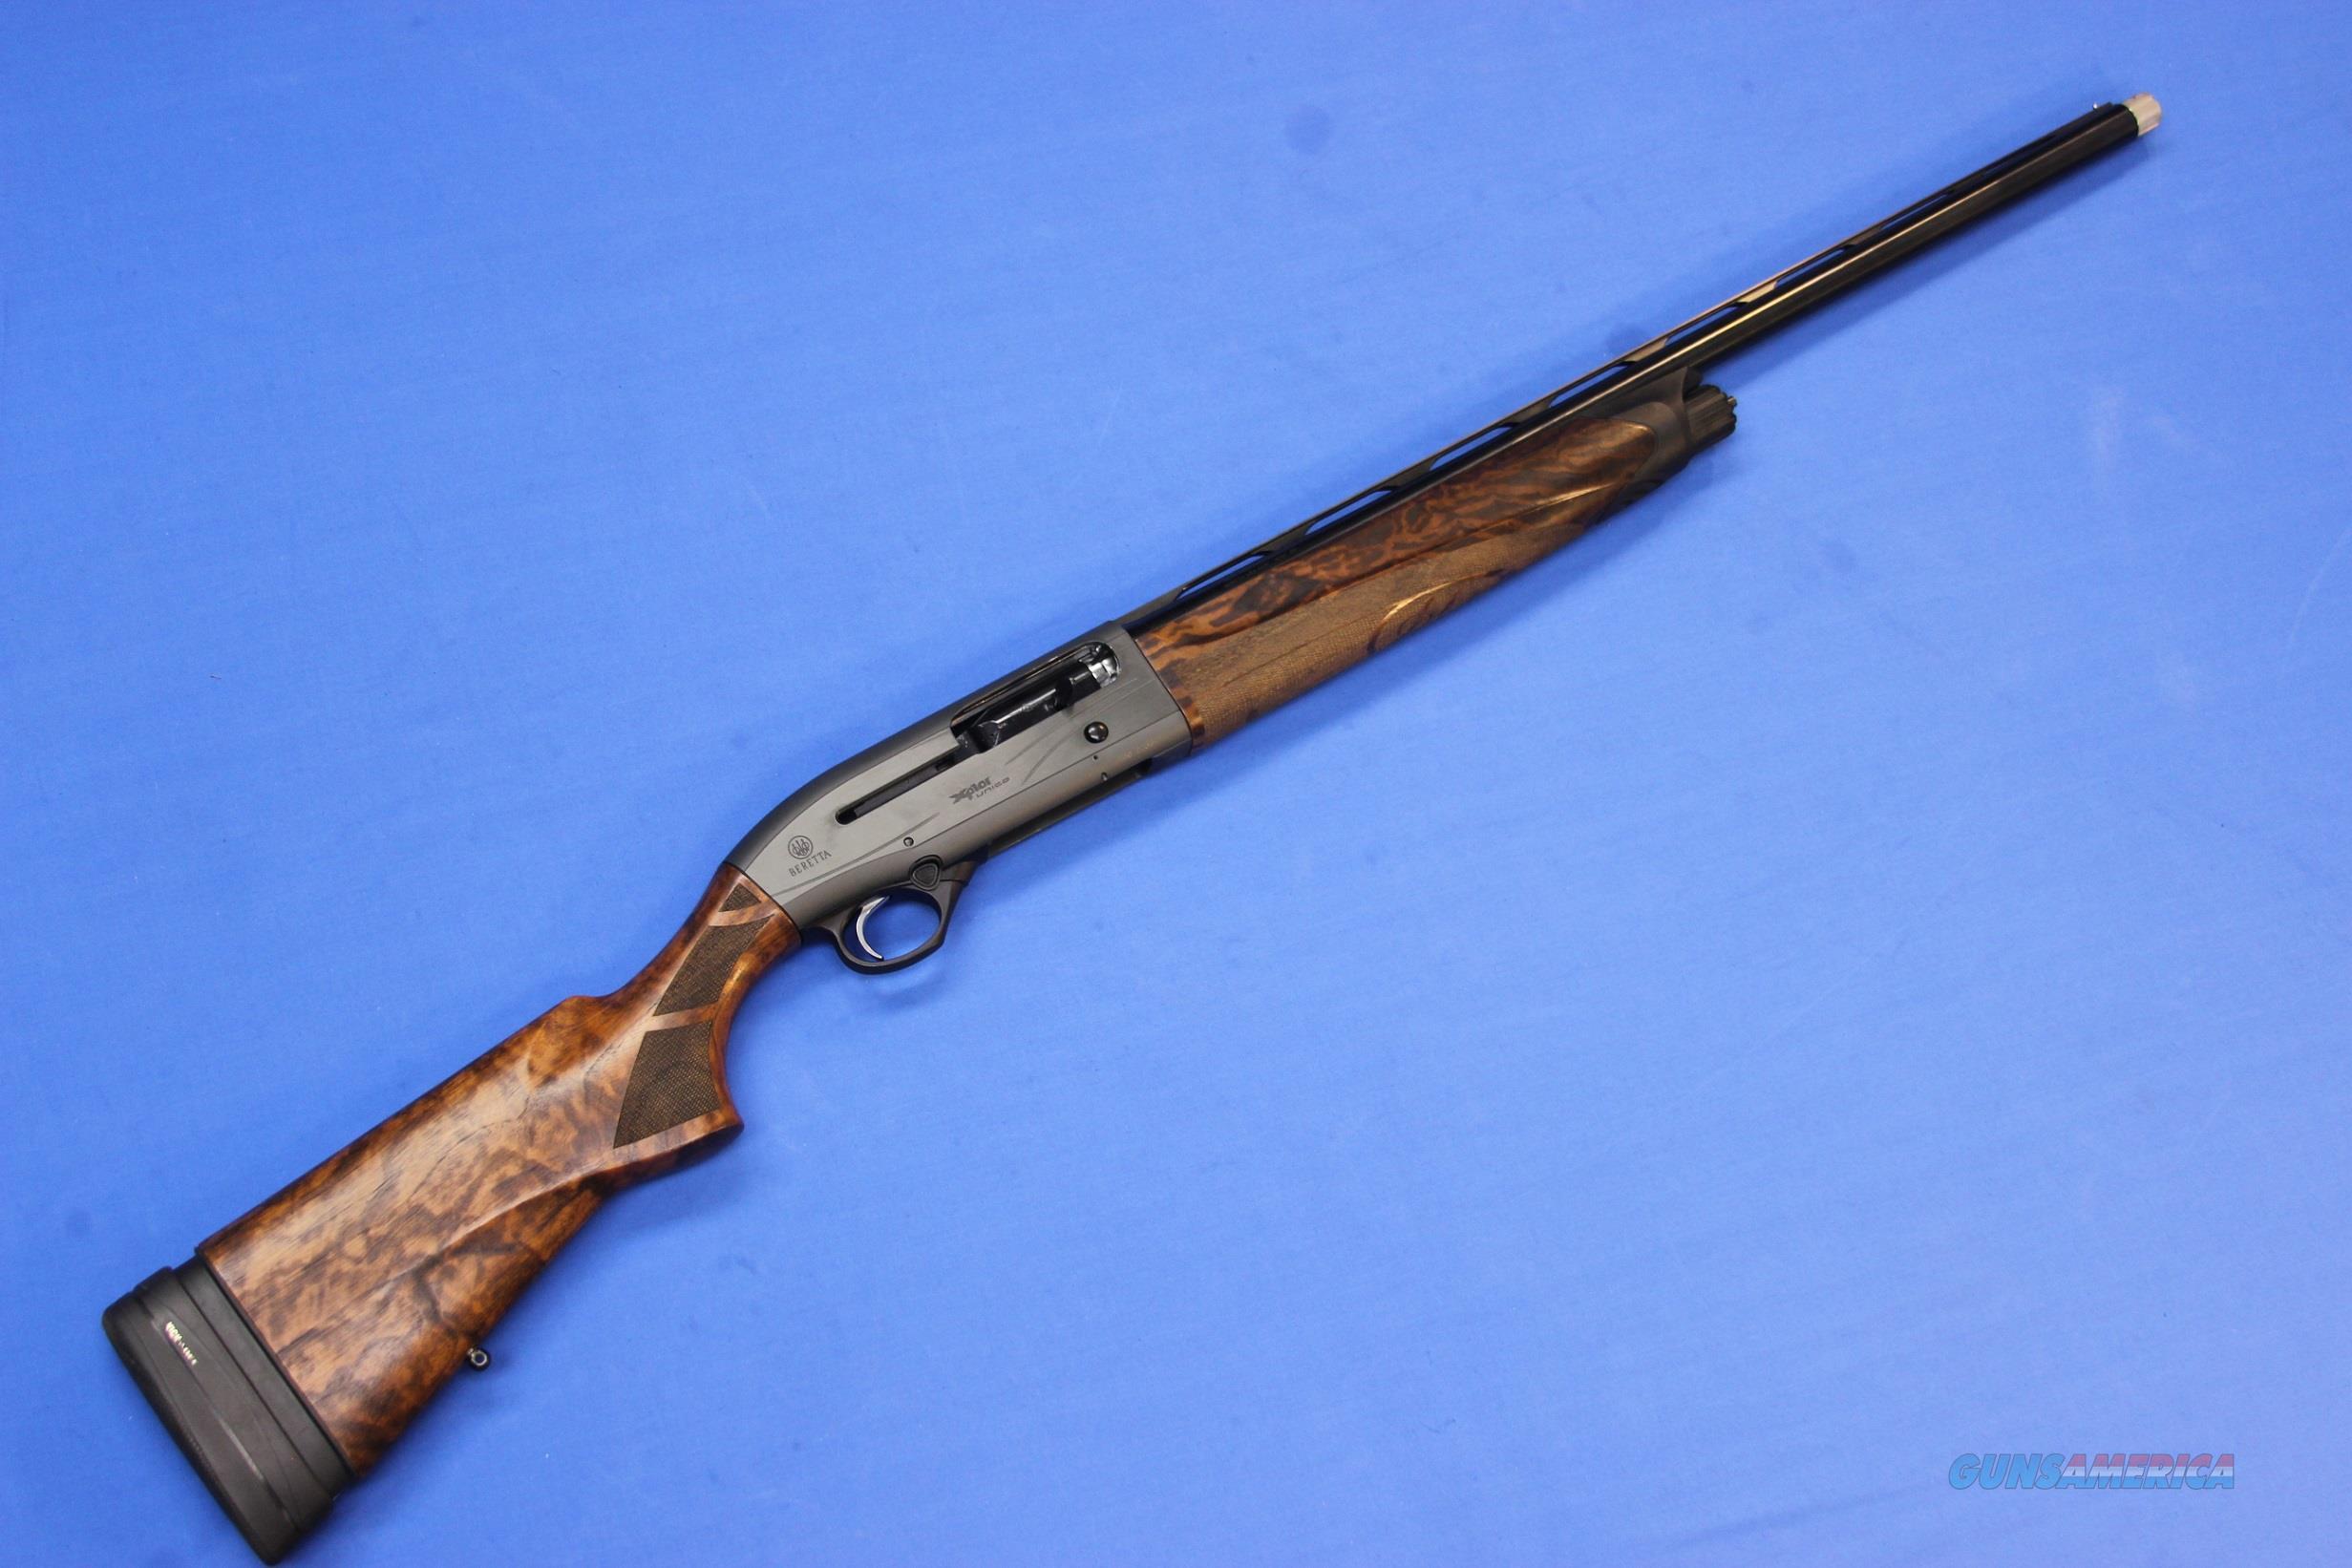 beretta a400 xplor unico w ko 12 gauge 3 5 v for sale rh gunsamerica com Xplor Playa Del Carmen Xplor Playa Del Carmen